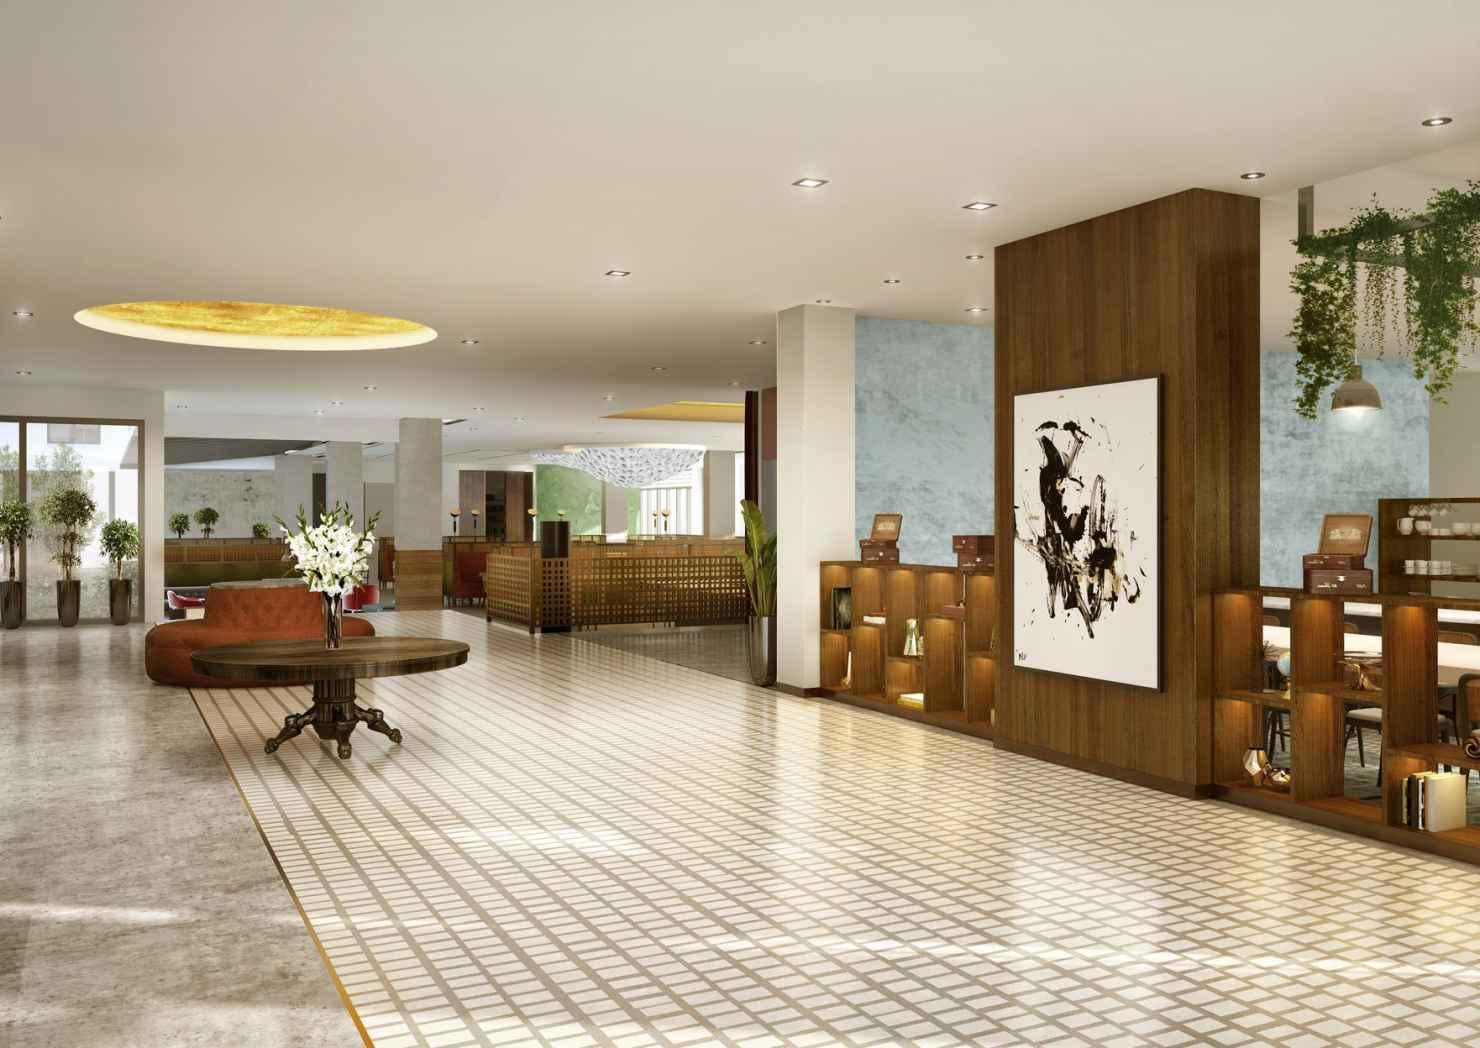 Hotel Haya combines Ybor's Historic Roots with Modern Comfort